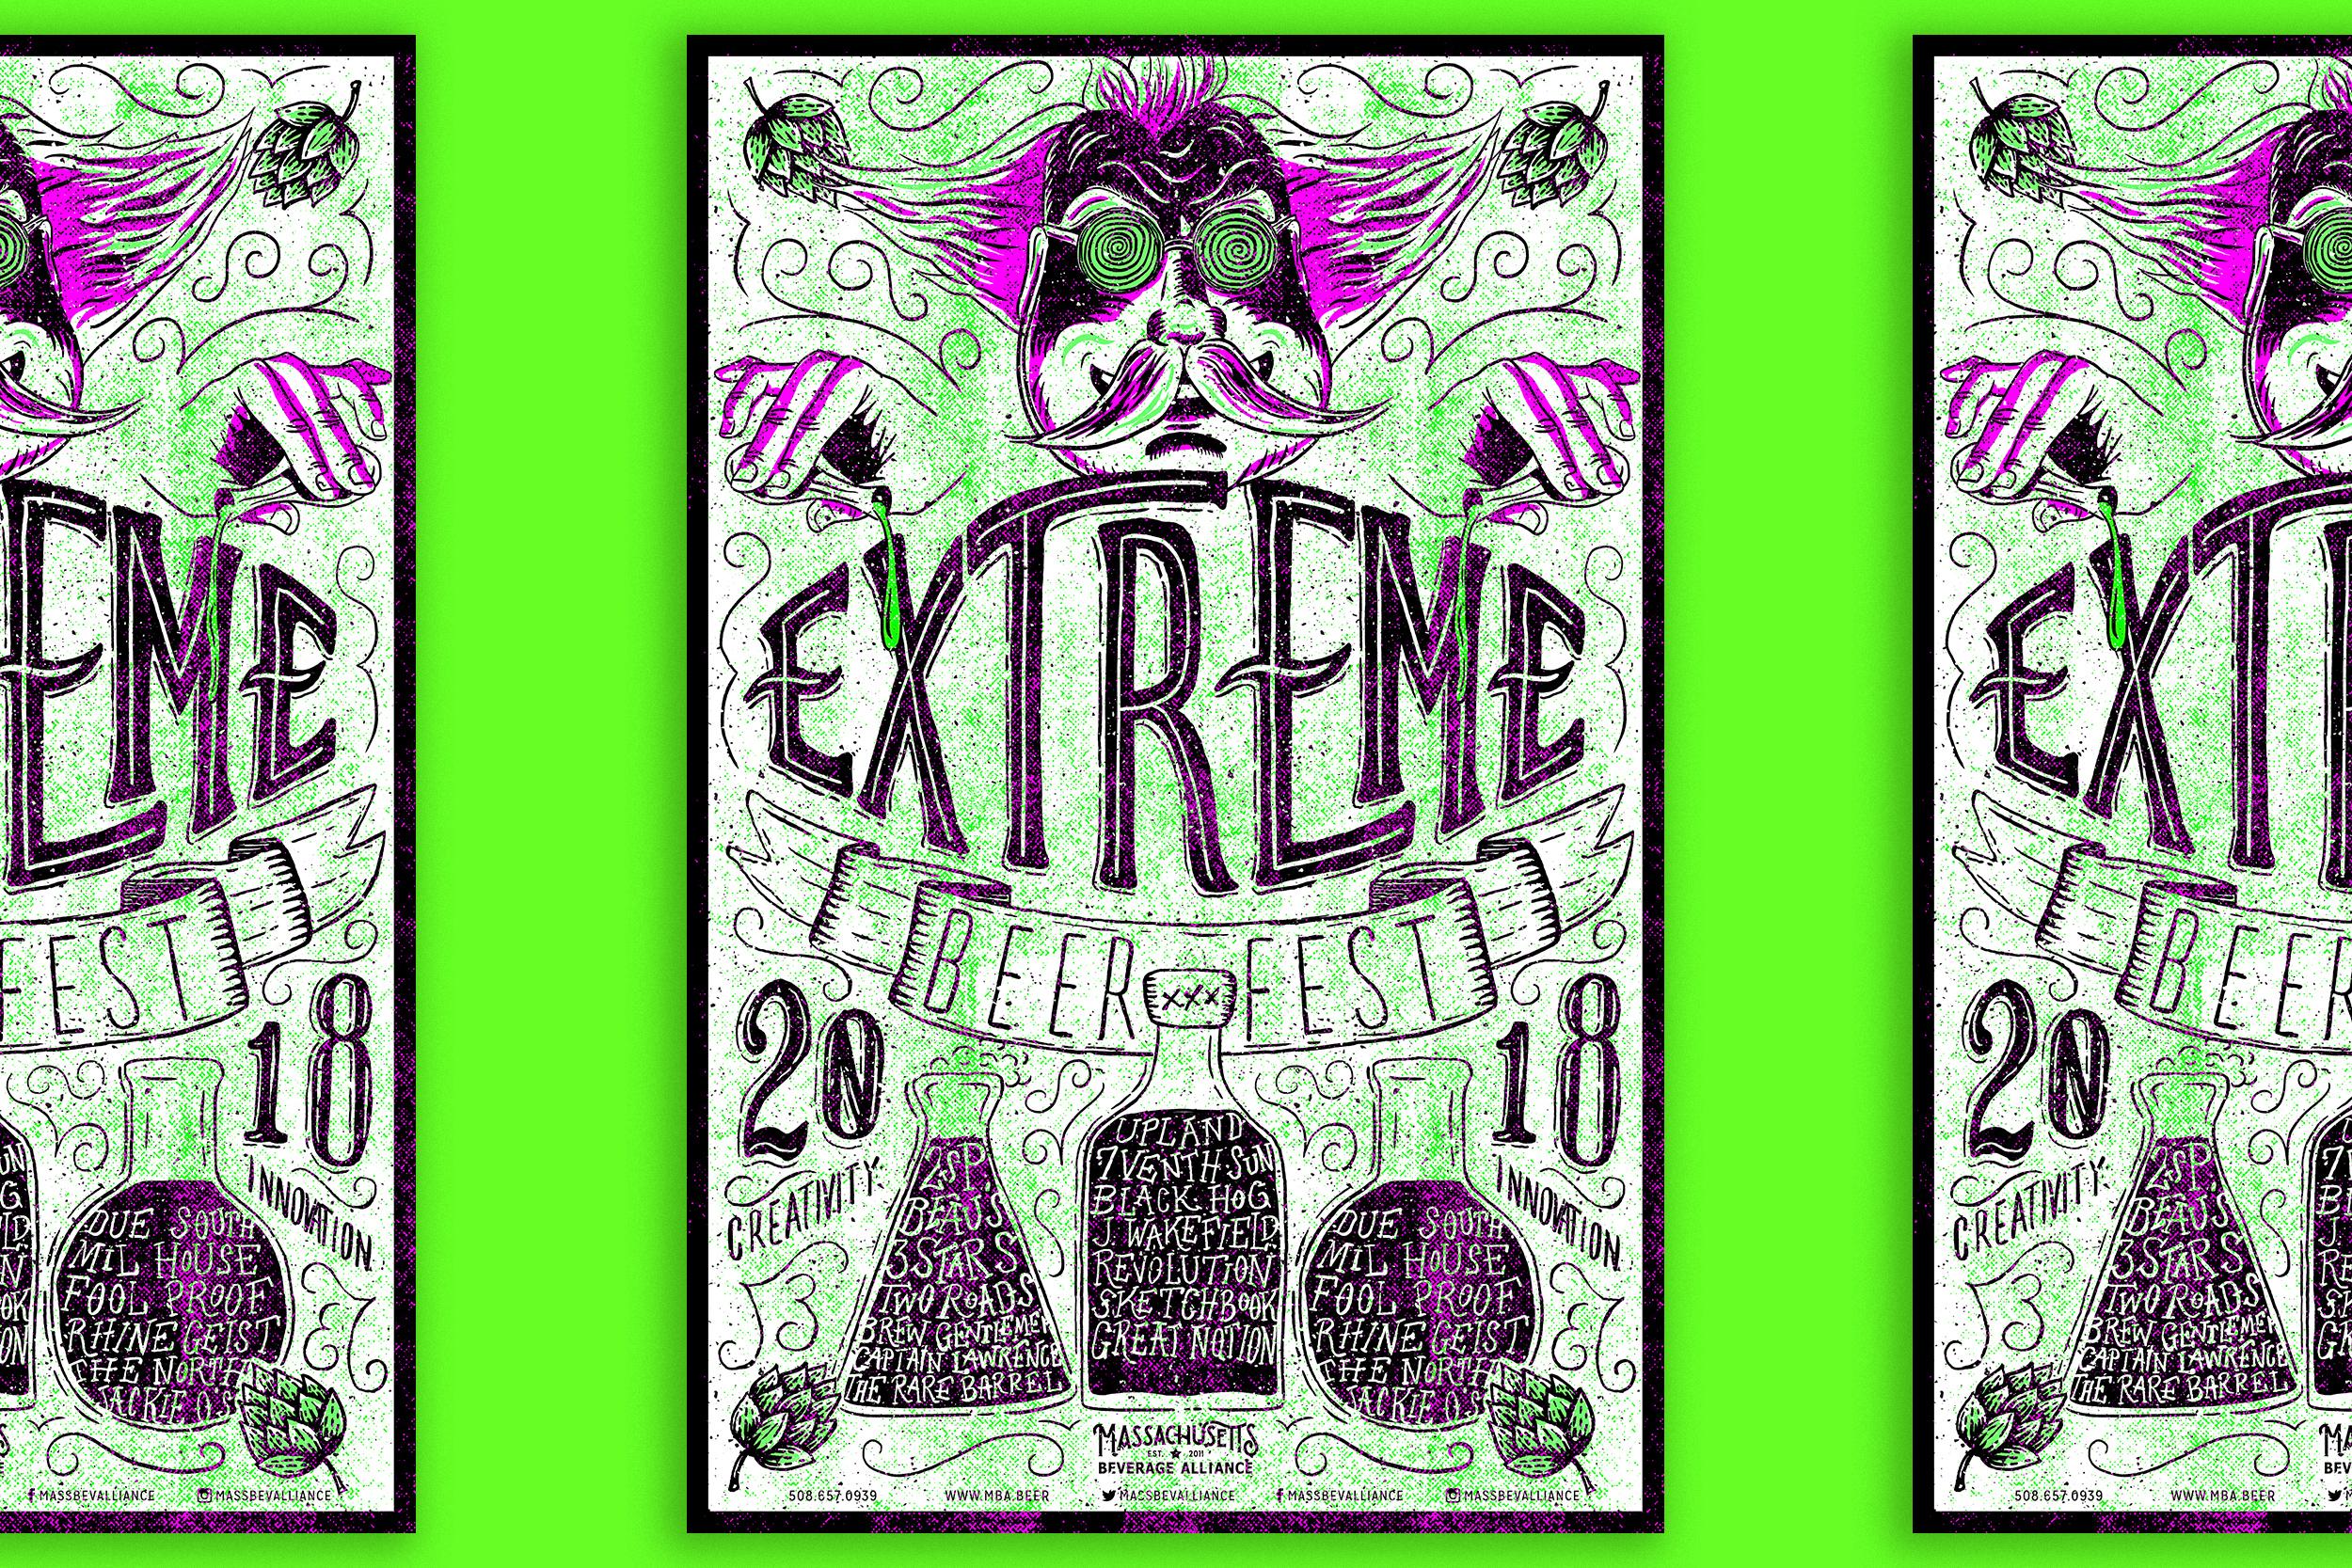 ExtremeBeerFest.jpg